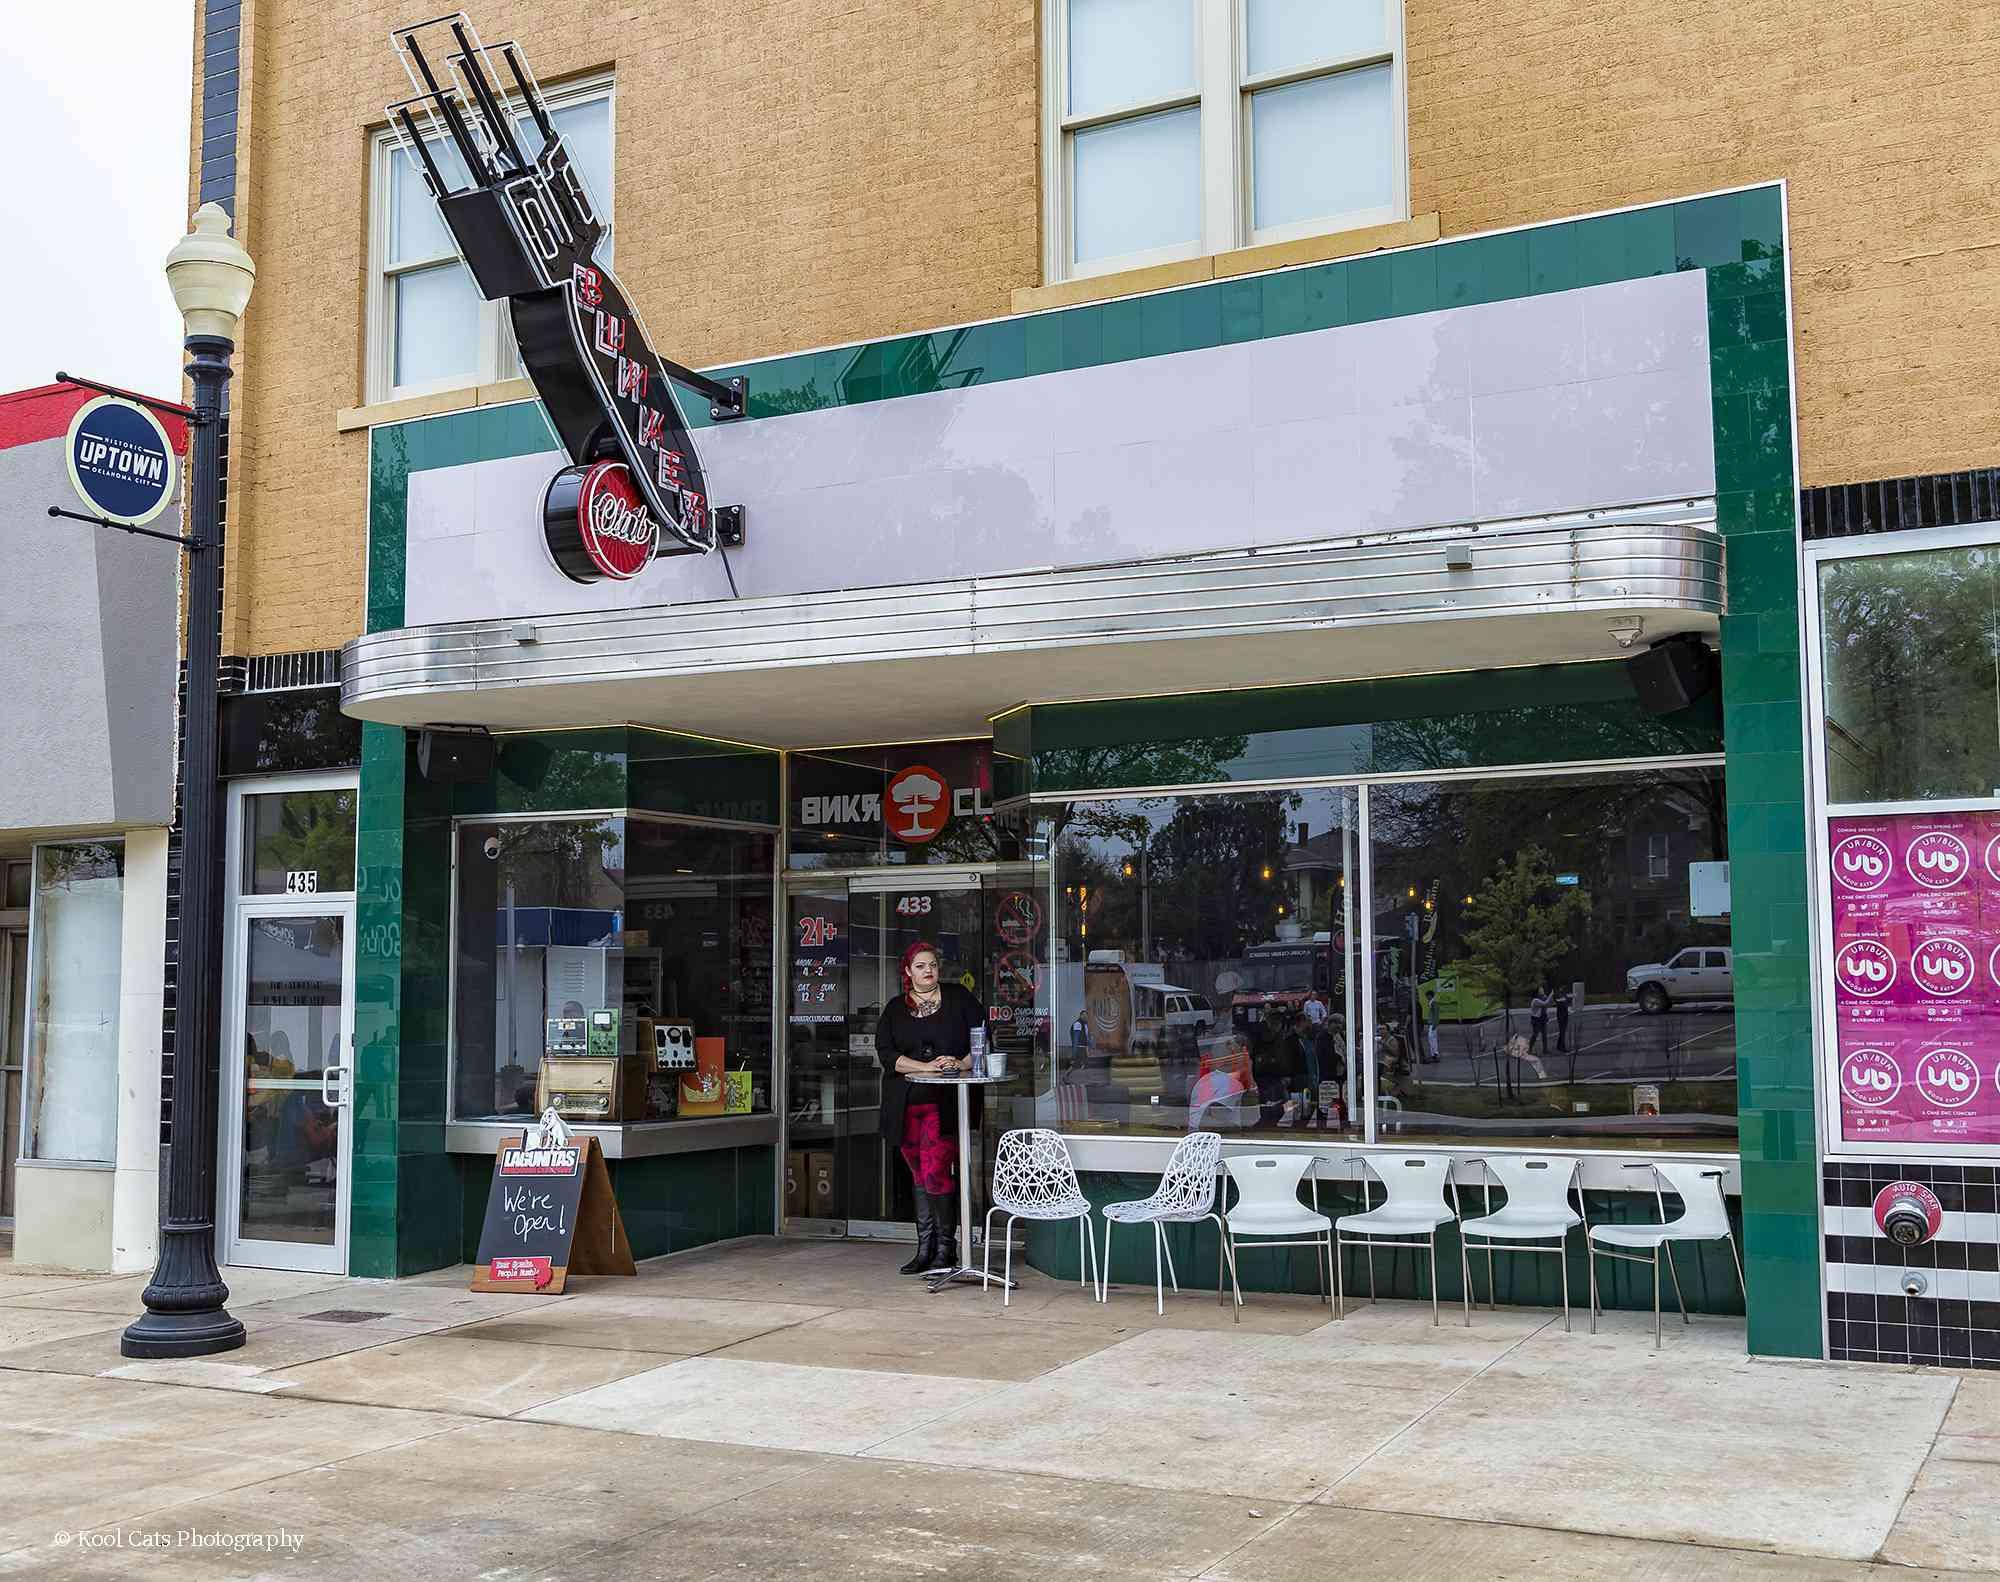 Local restaurant in Uptown 23rd